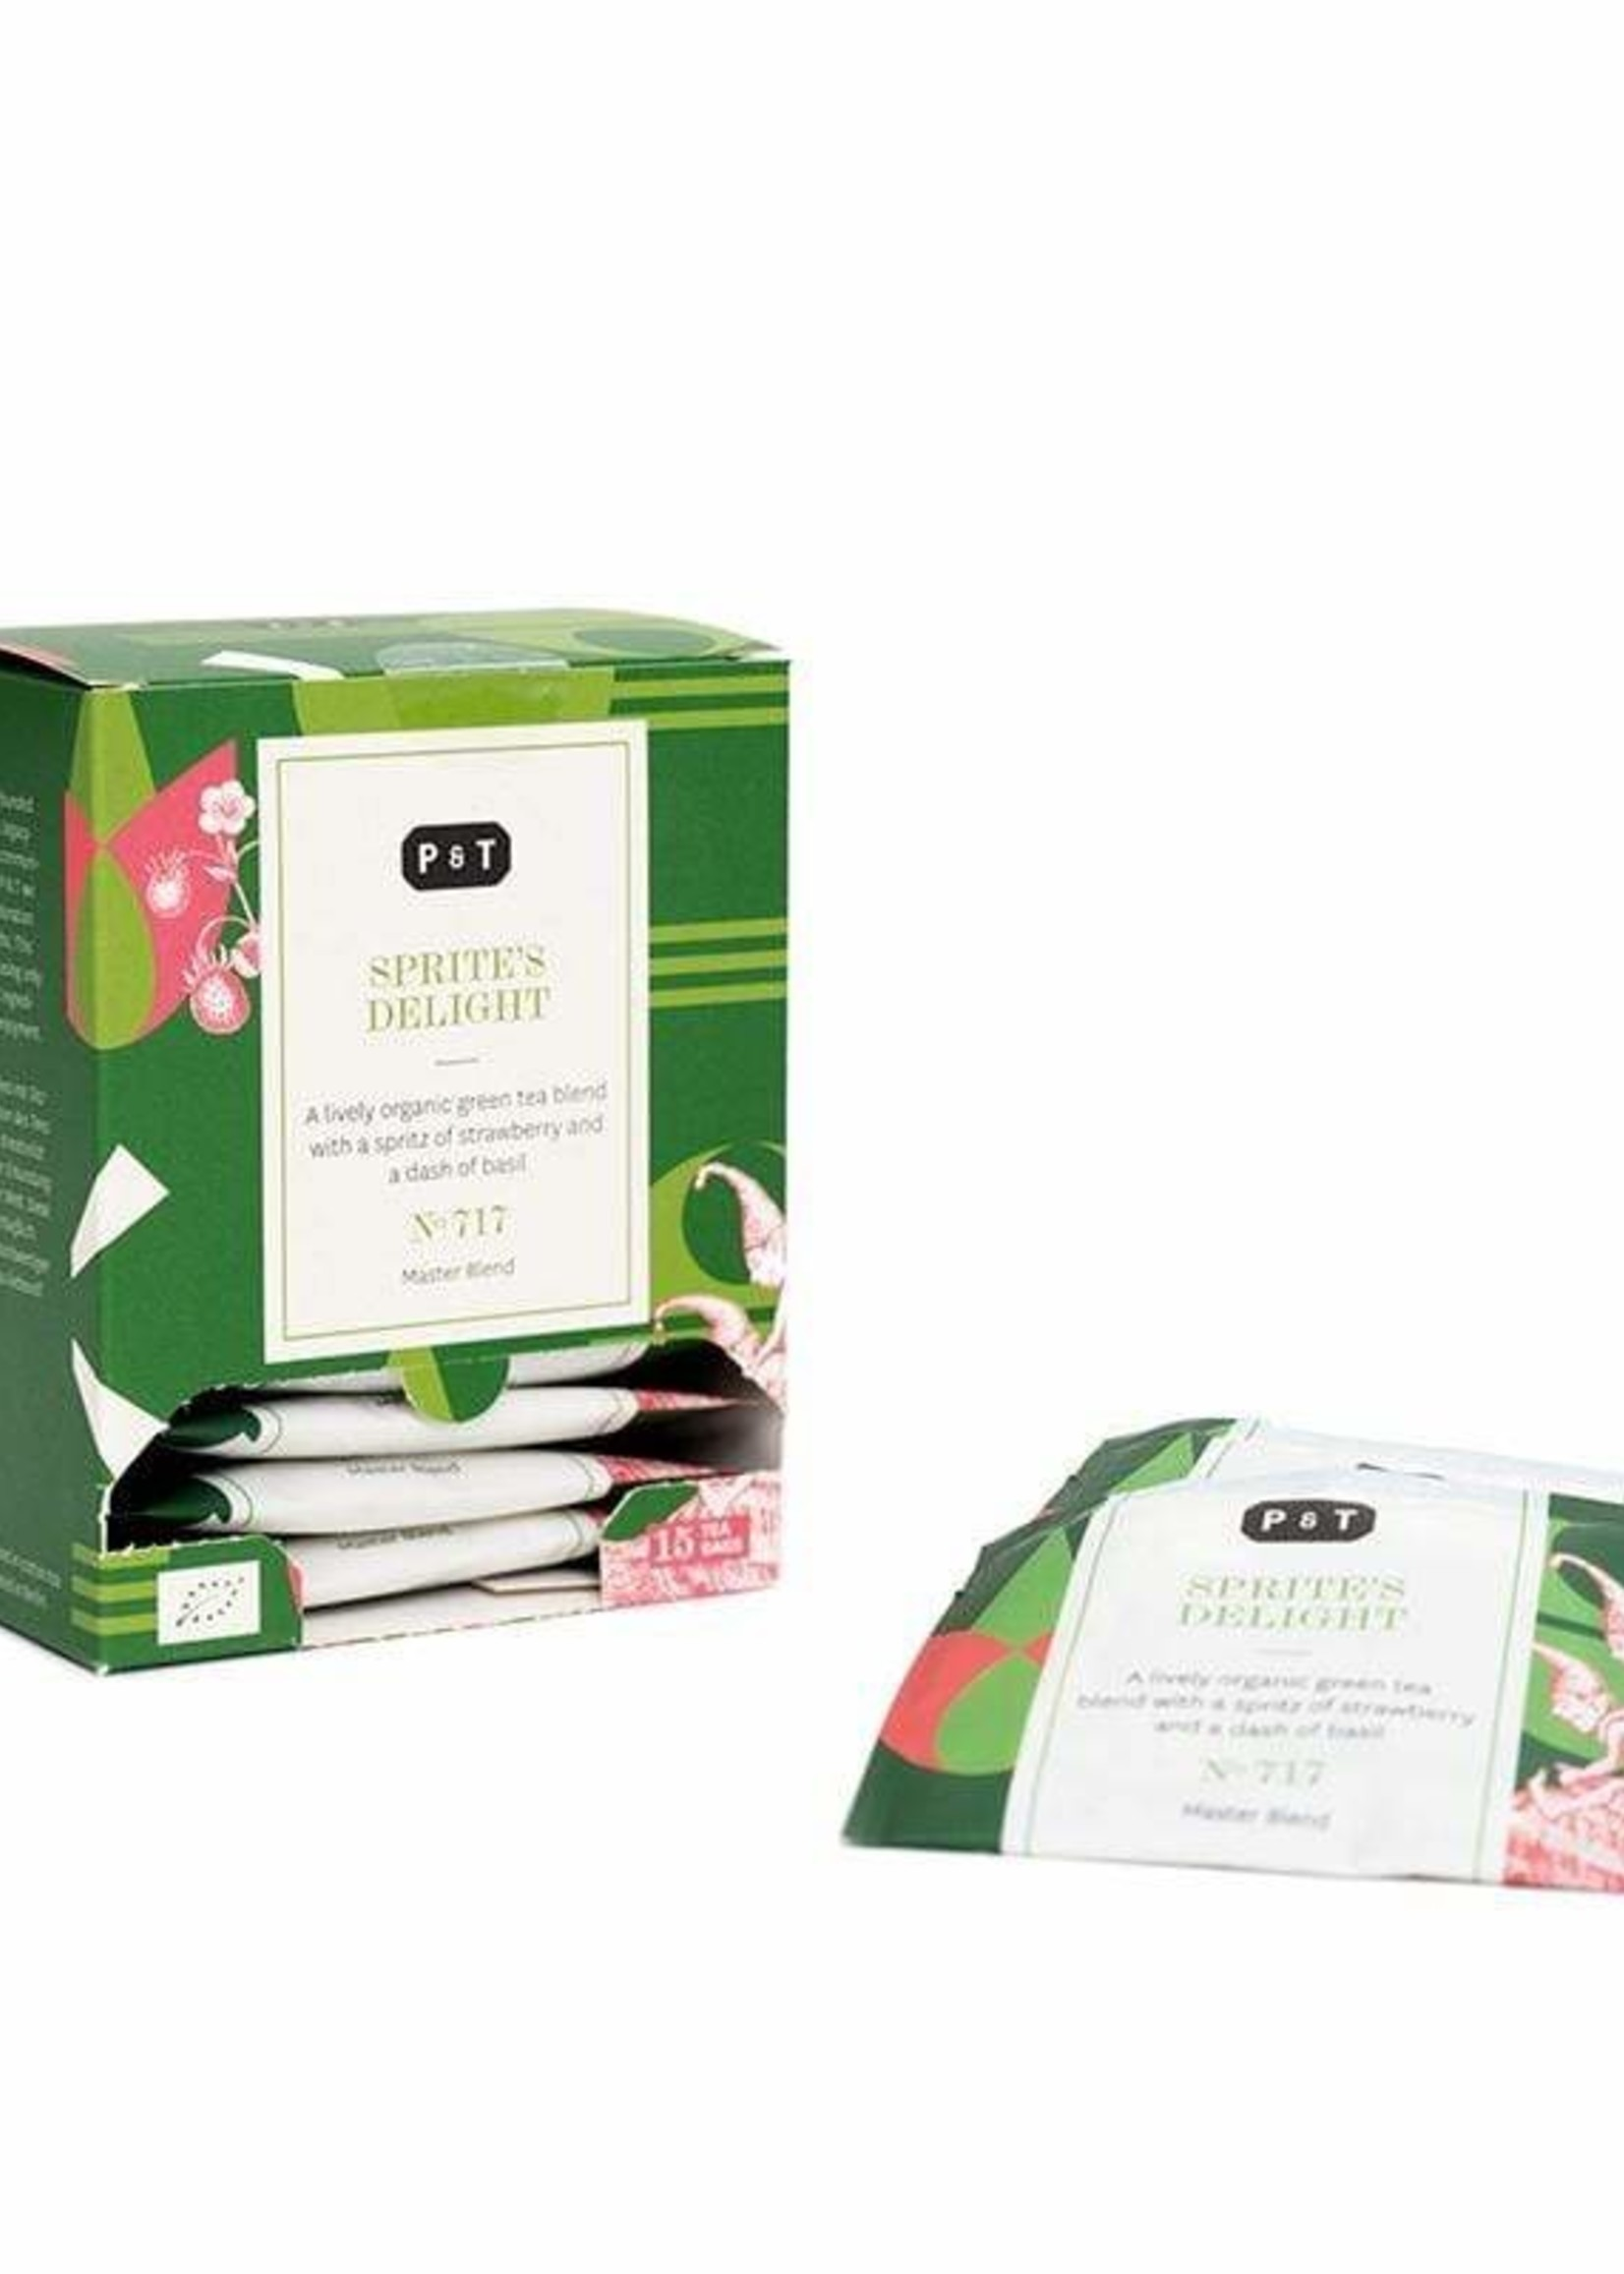 Paper and Tea Sprites Delight No. 717